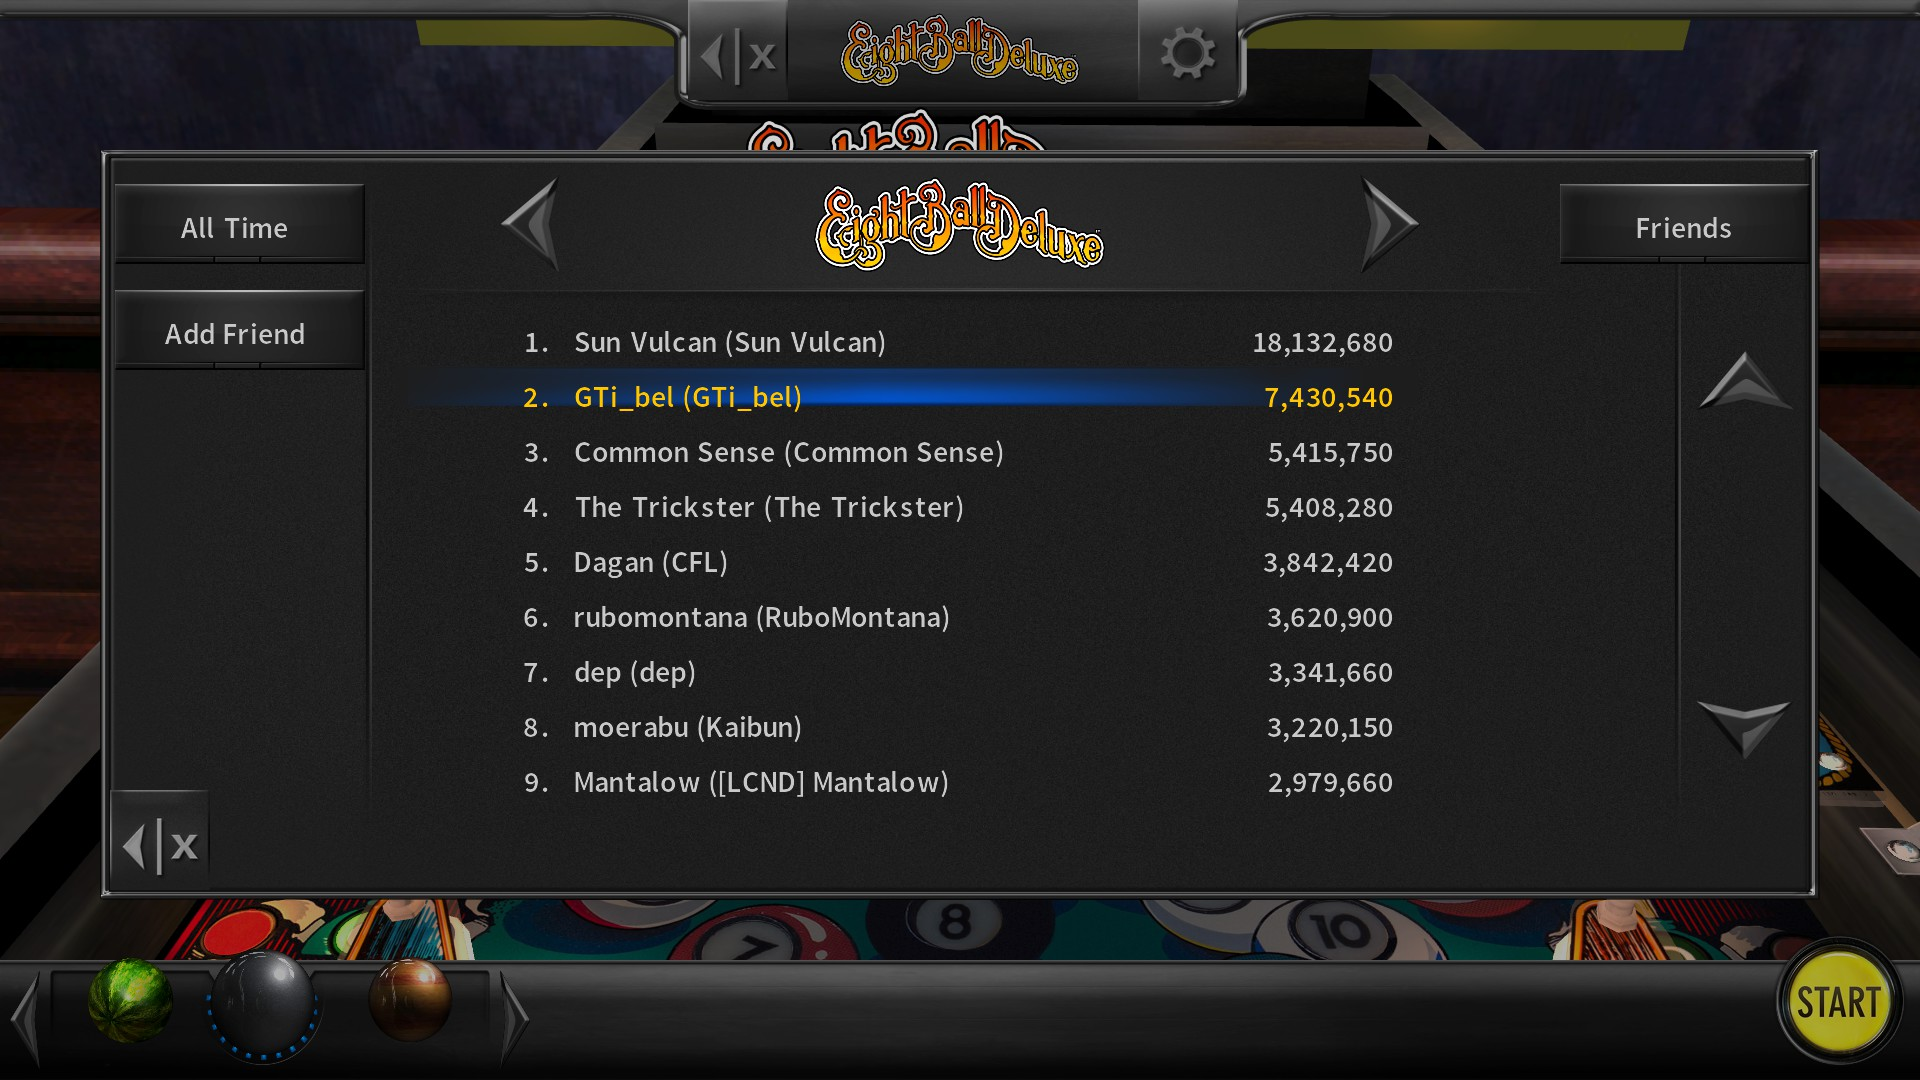 GTibel: Pinball Arcade: Eight Ball Deluxe (PC) 7,430,540 points on 2018-07-25 11:37:16